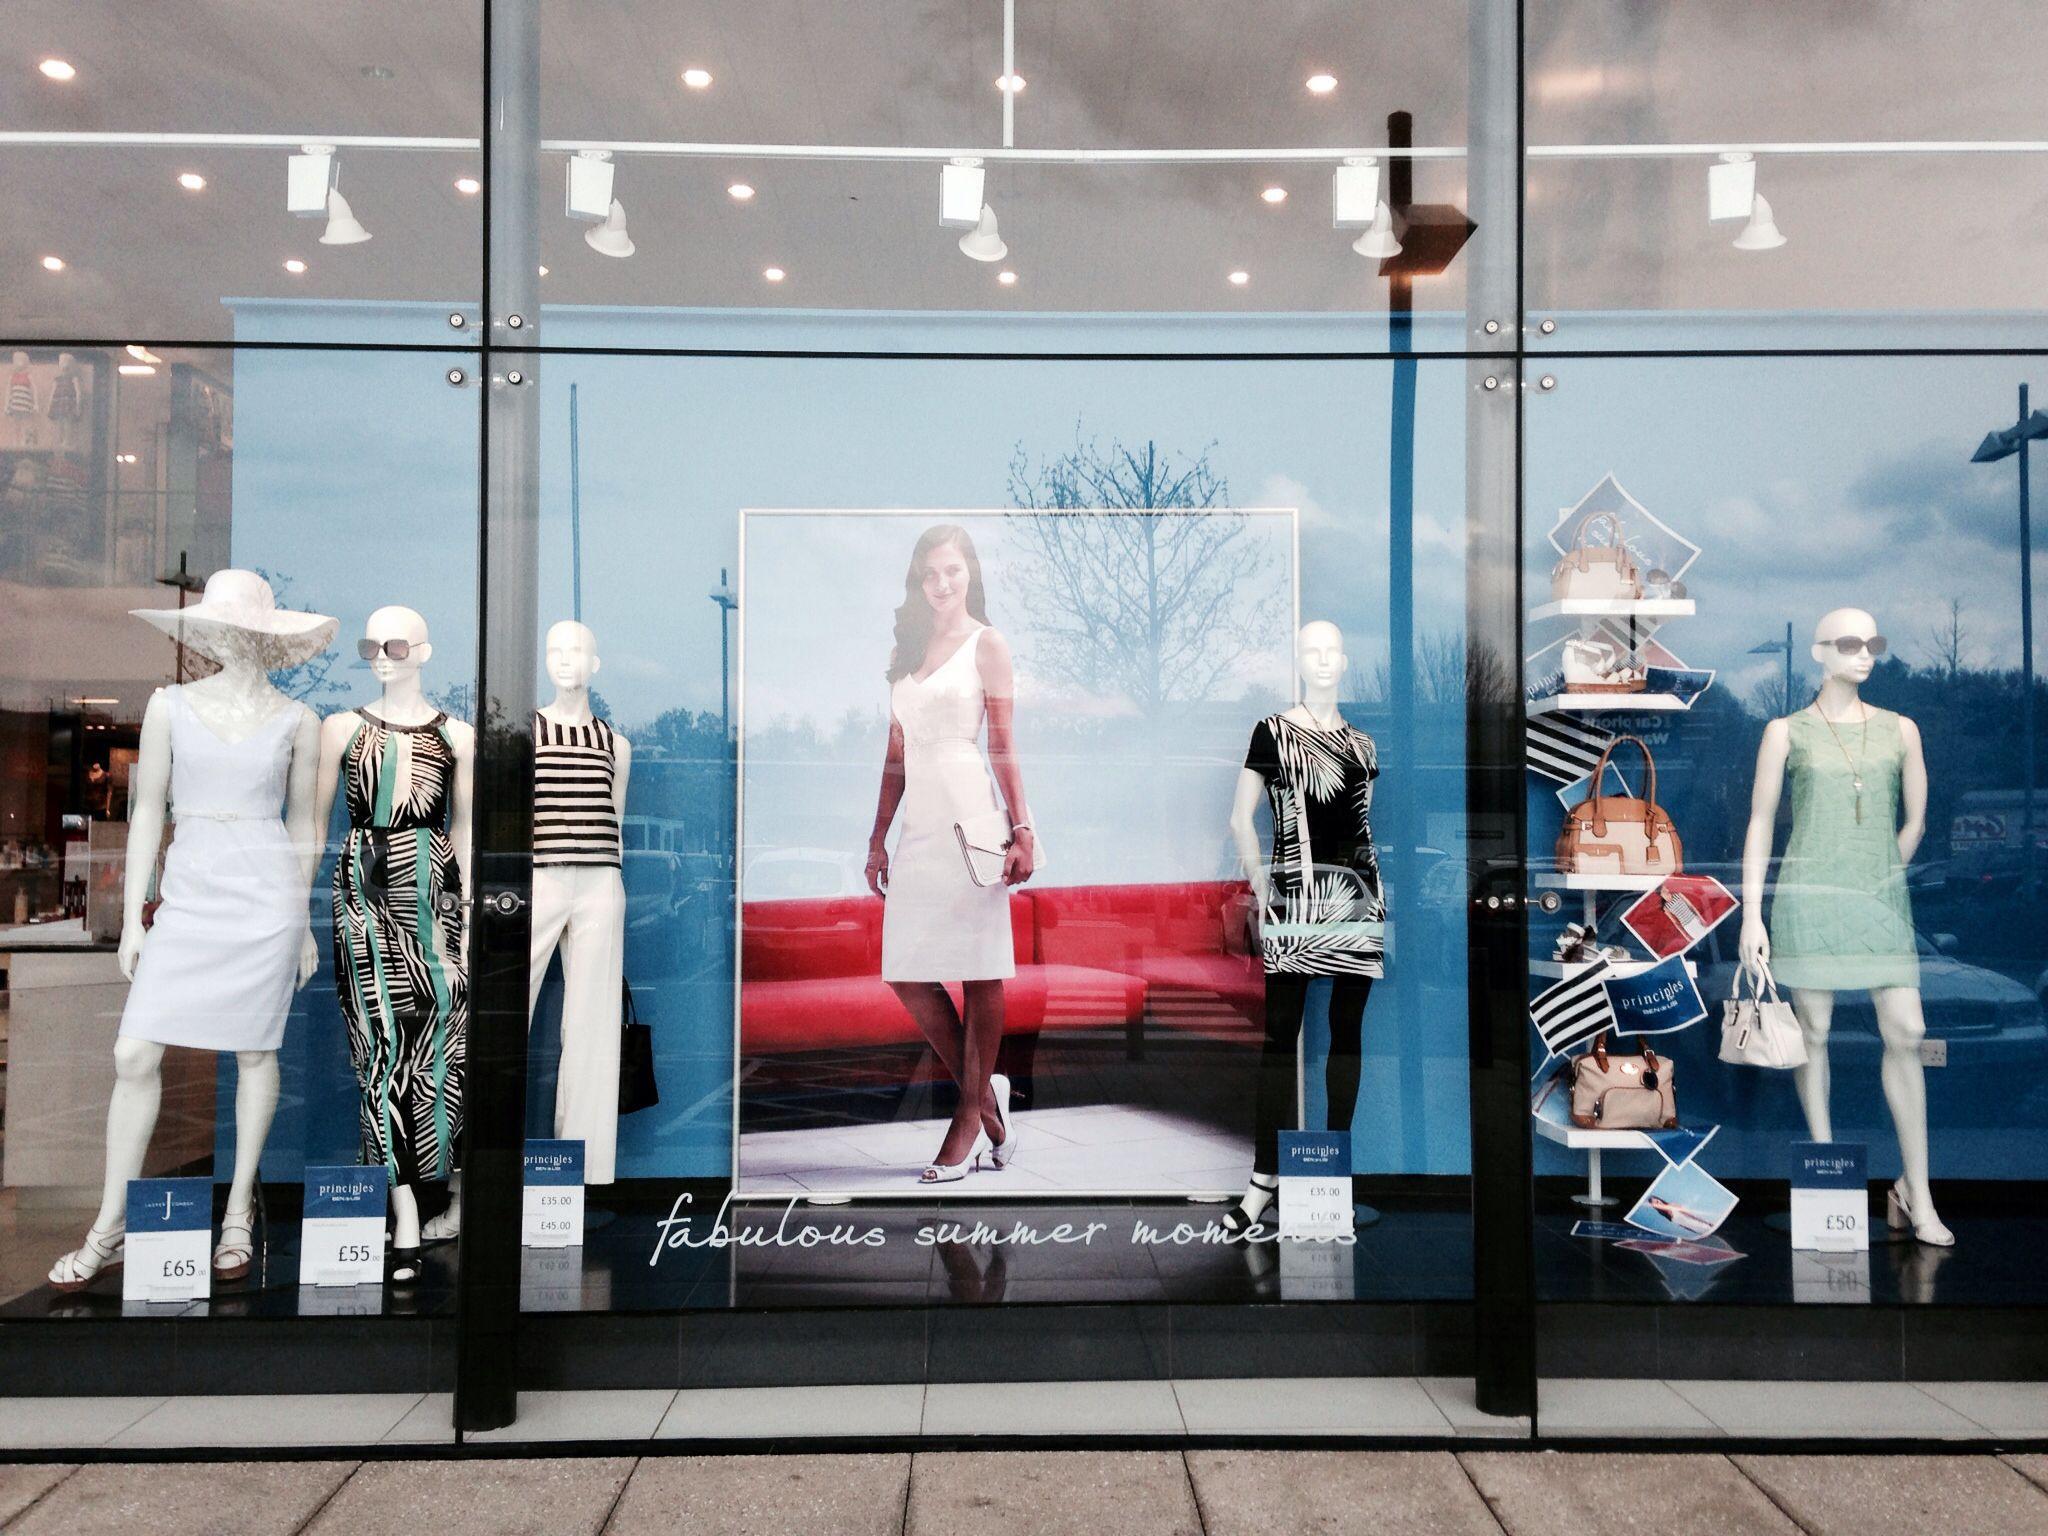 Summer moments jasperconran principles debenhams ss14 debenhamswindow displaysvisual merchandising